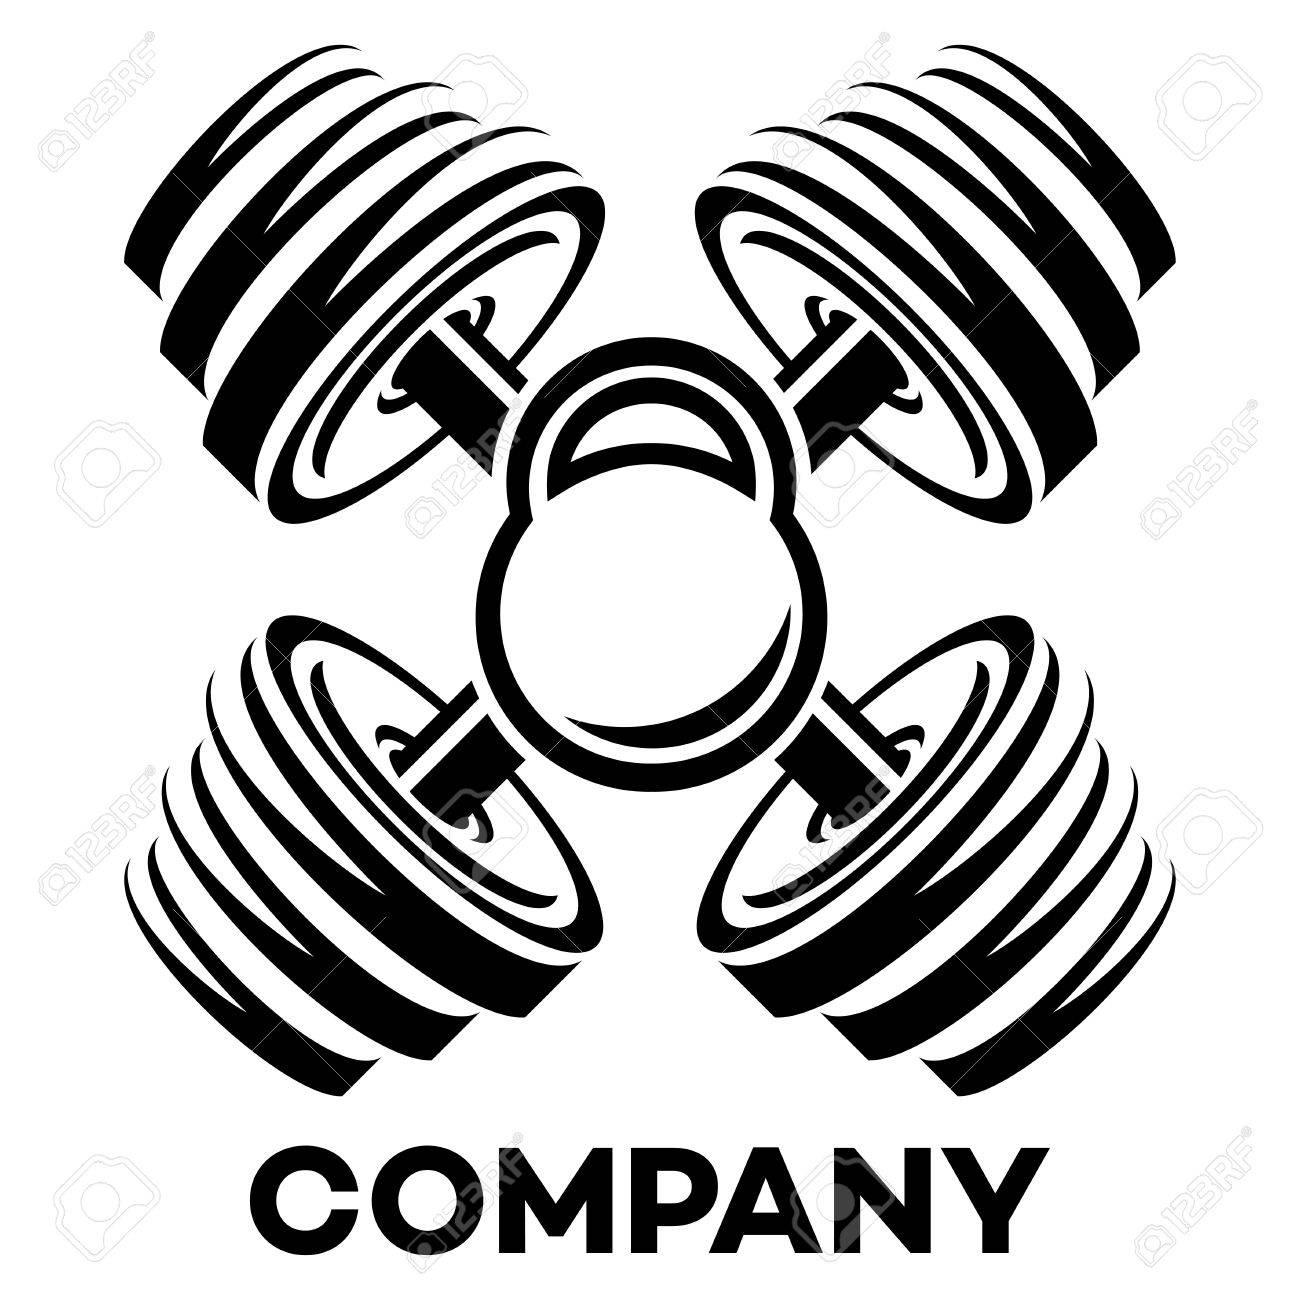 bodybuilding logo royalty free cliparts vectors and stock rh 123rf com bodybuilding logo tank bodybuilding logos for t shirts